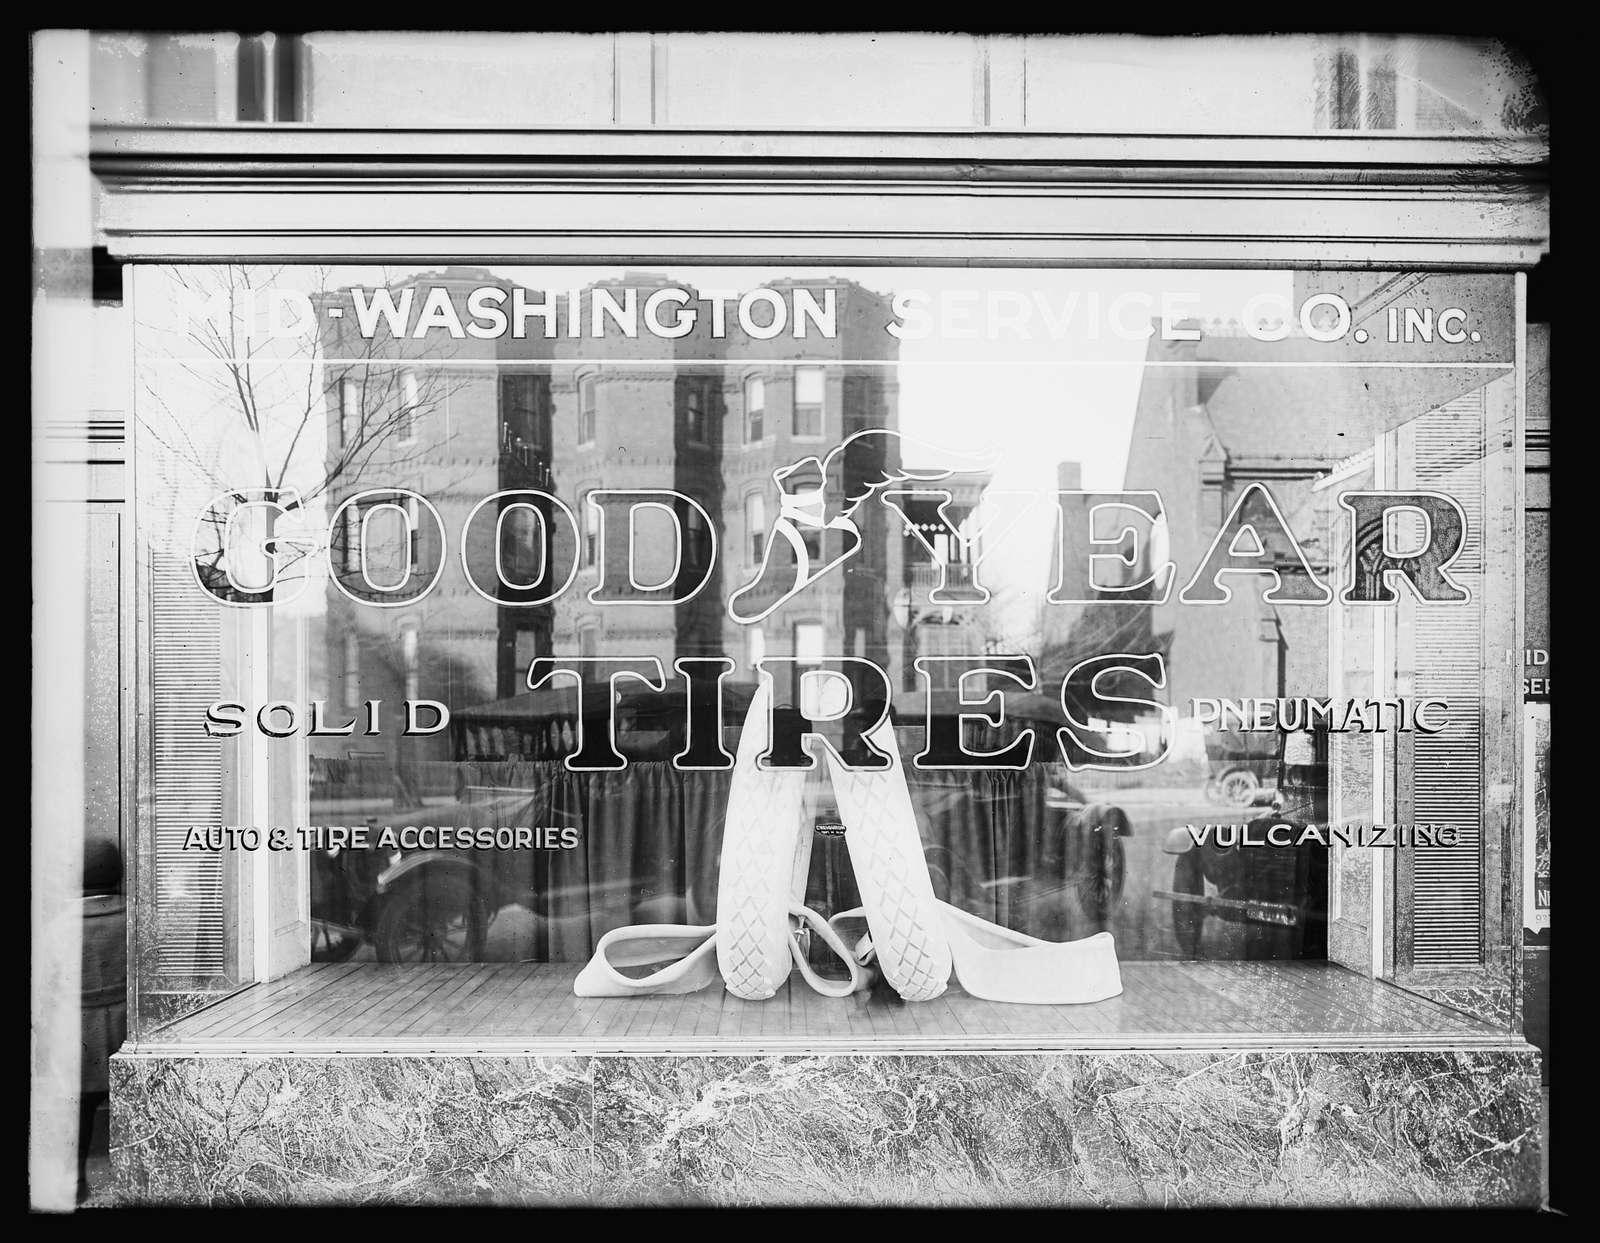 Mid Washington Service Co., Inc., exterior